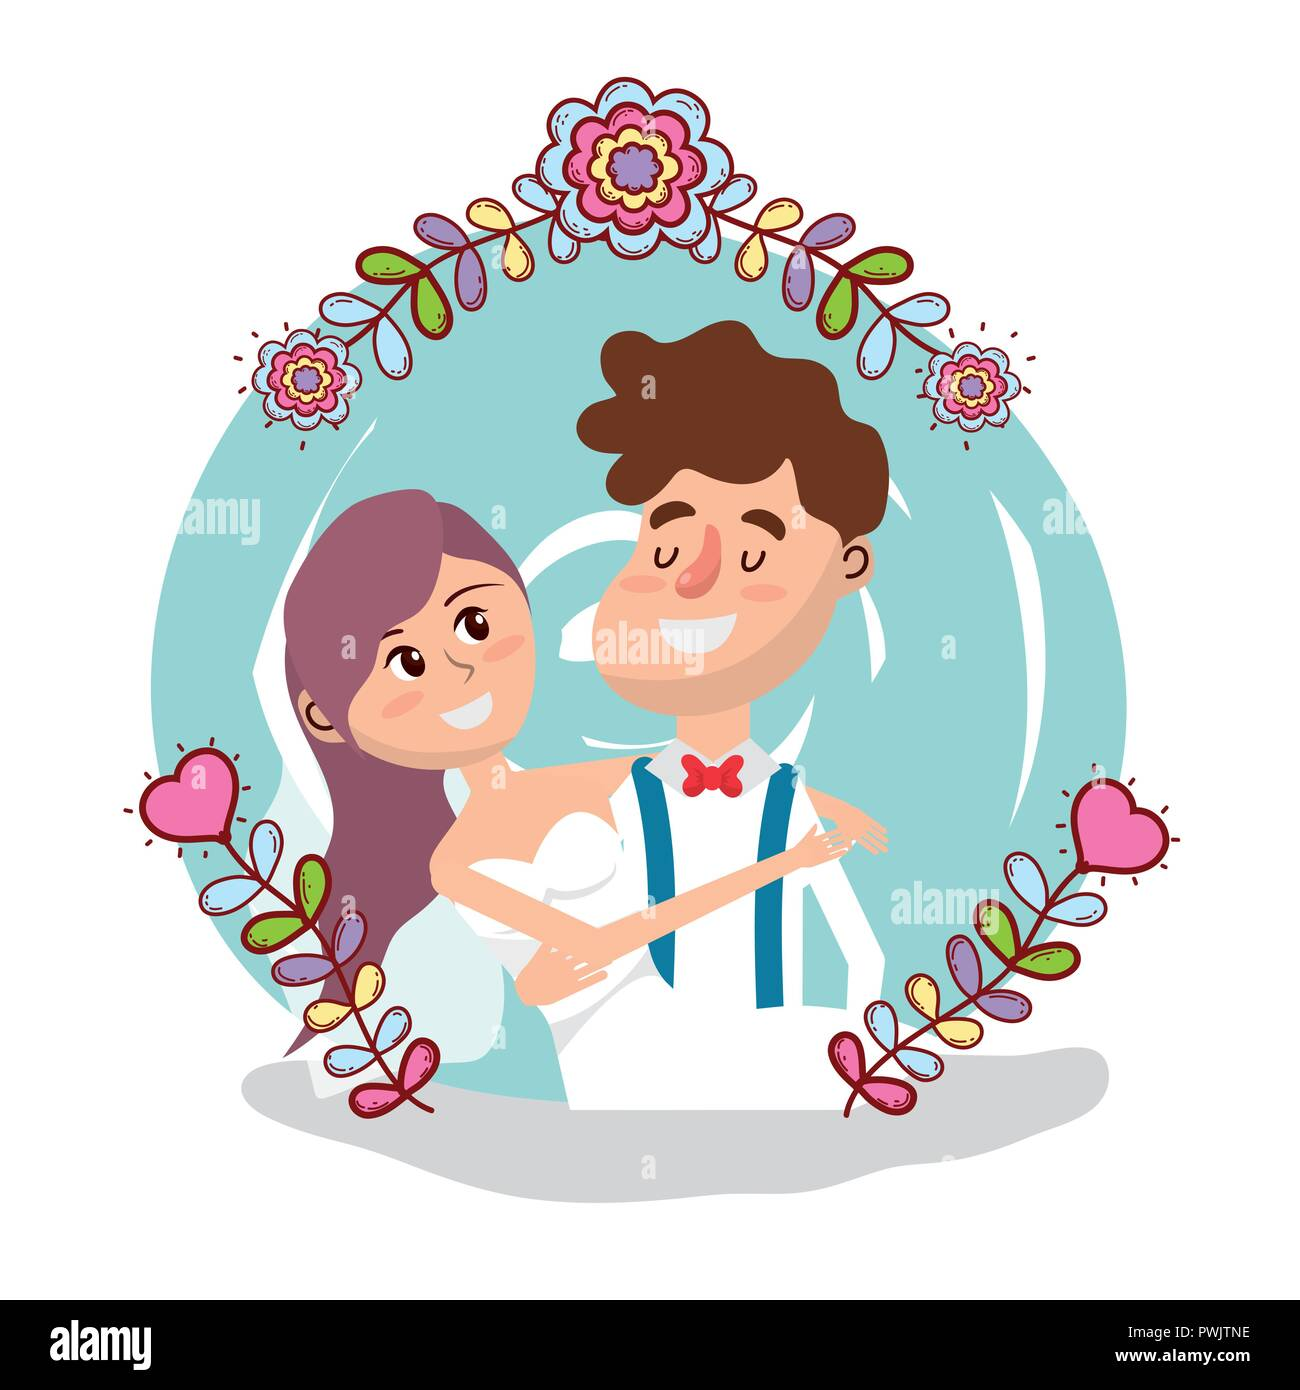 Wedding Card Design Cartoon Stock Vector Art Illustration